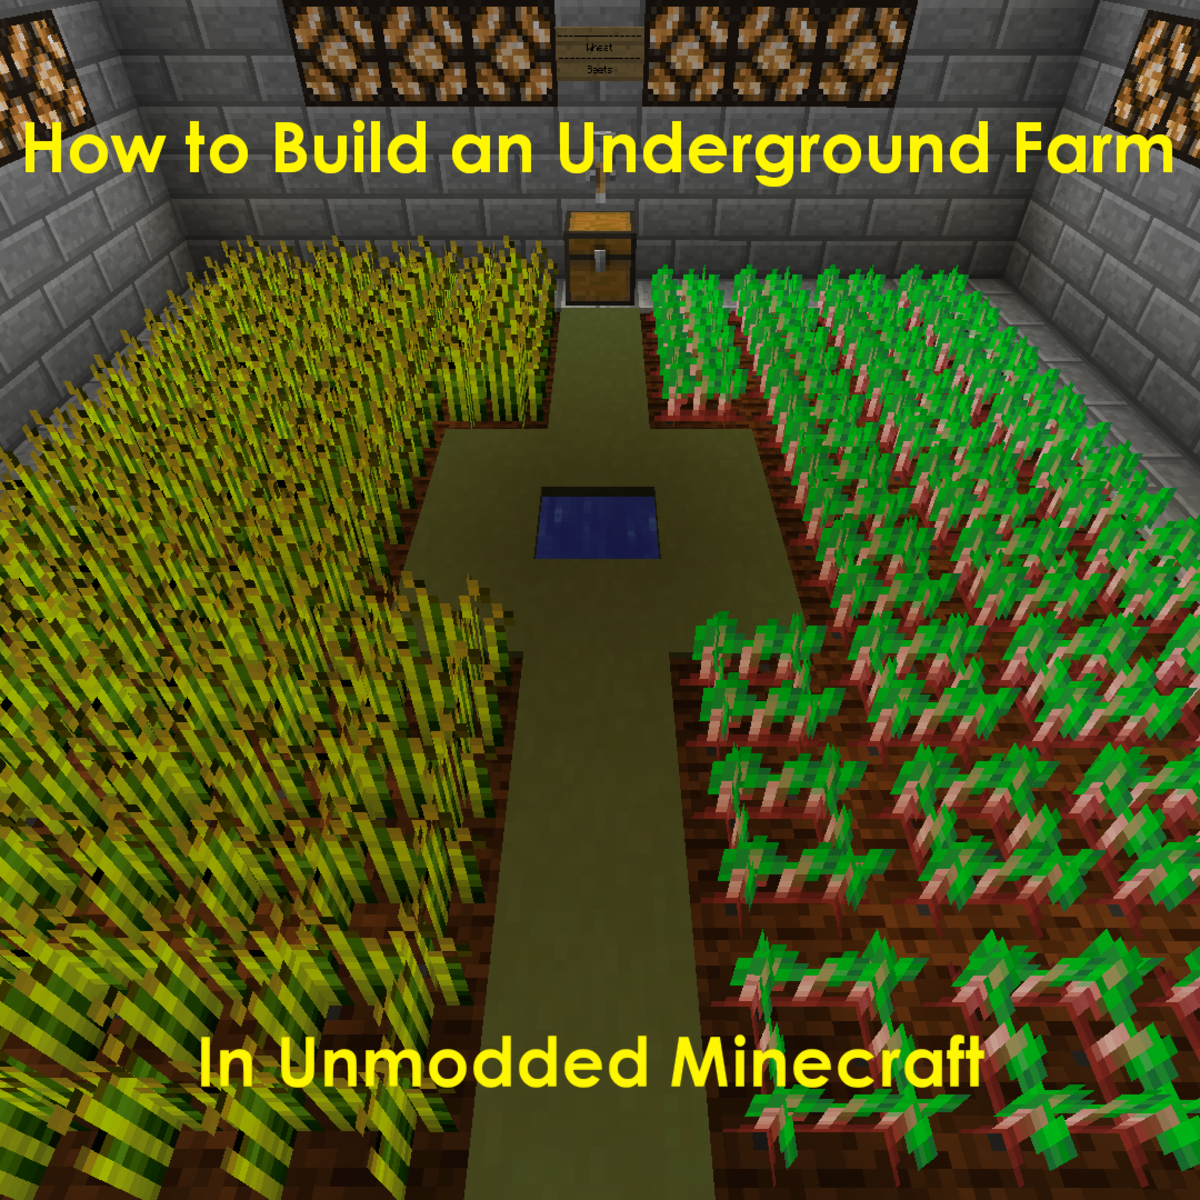 How To Build An Underground Farm In Minecraft Levelskip Wiki Redstone Circuits